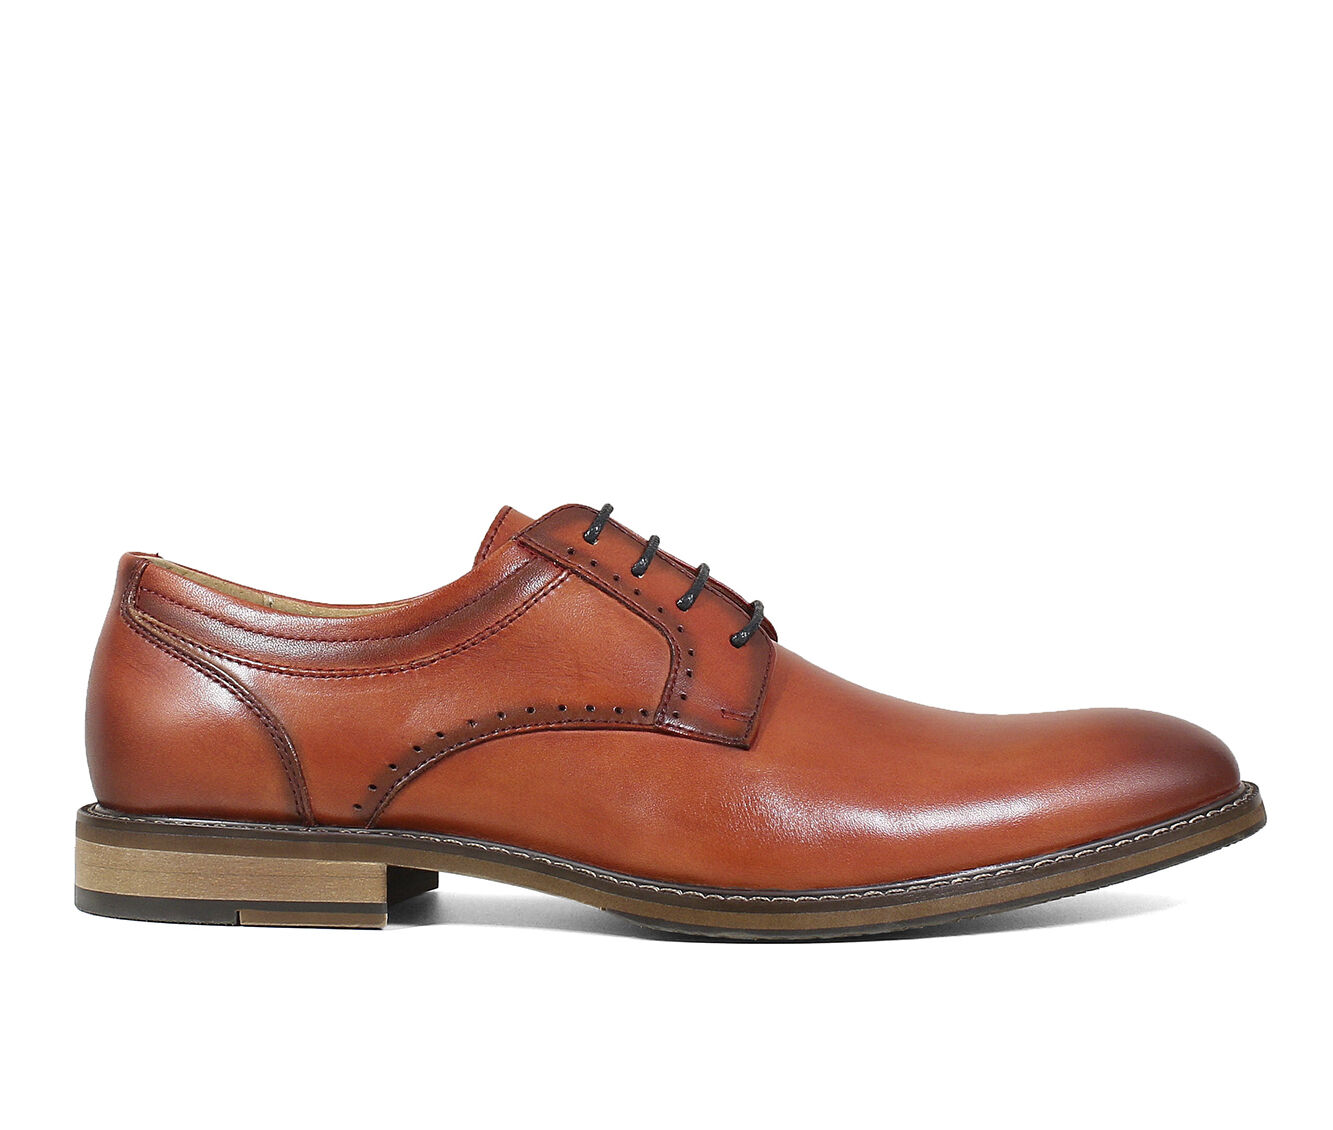 Men's Stacy Adams Faulkner Dress Shoes Cranberry